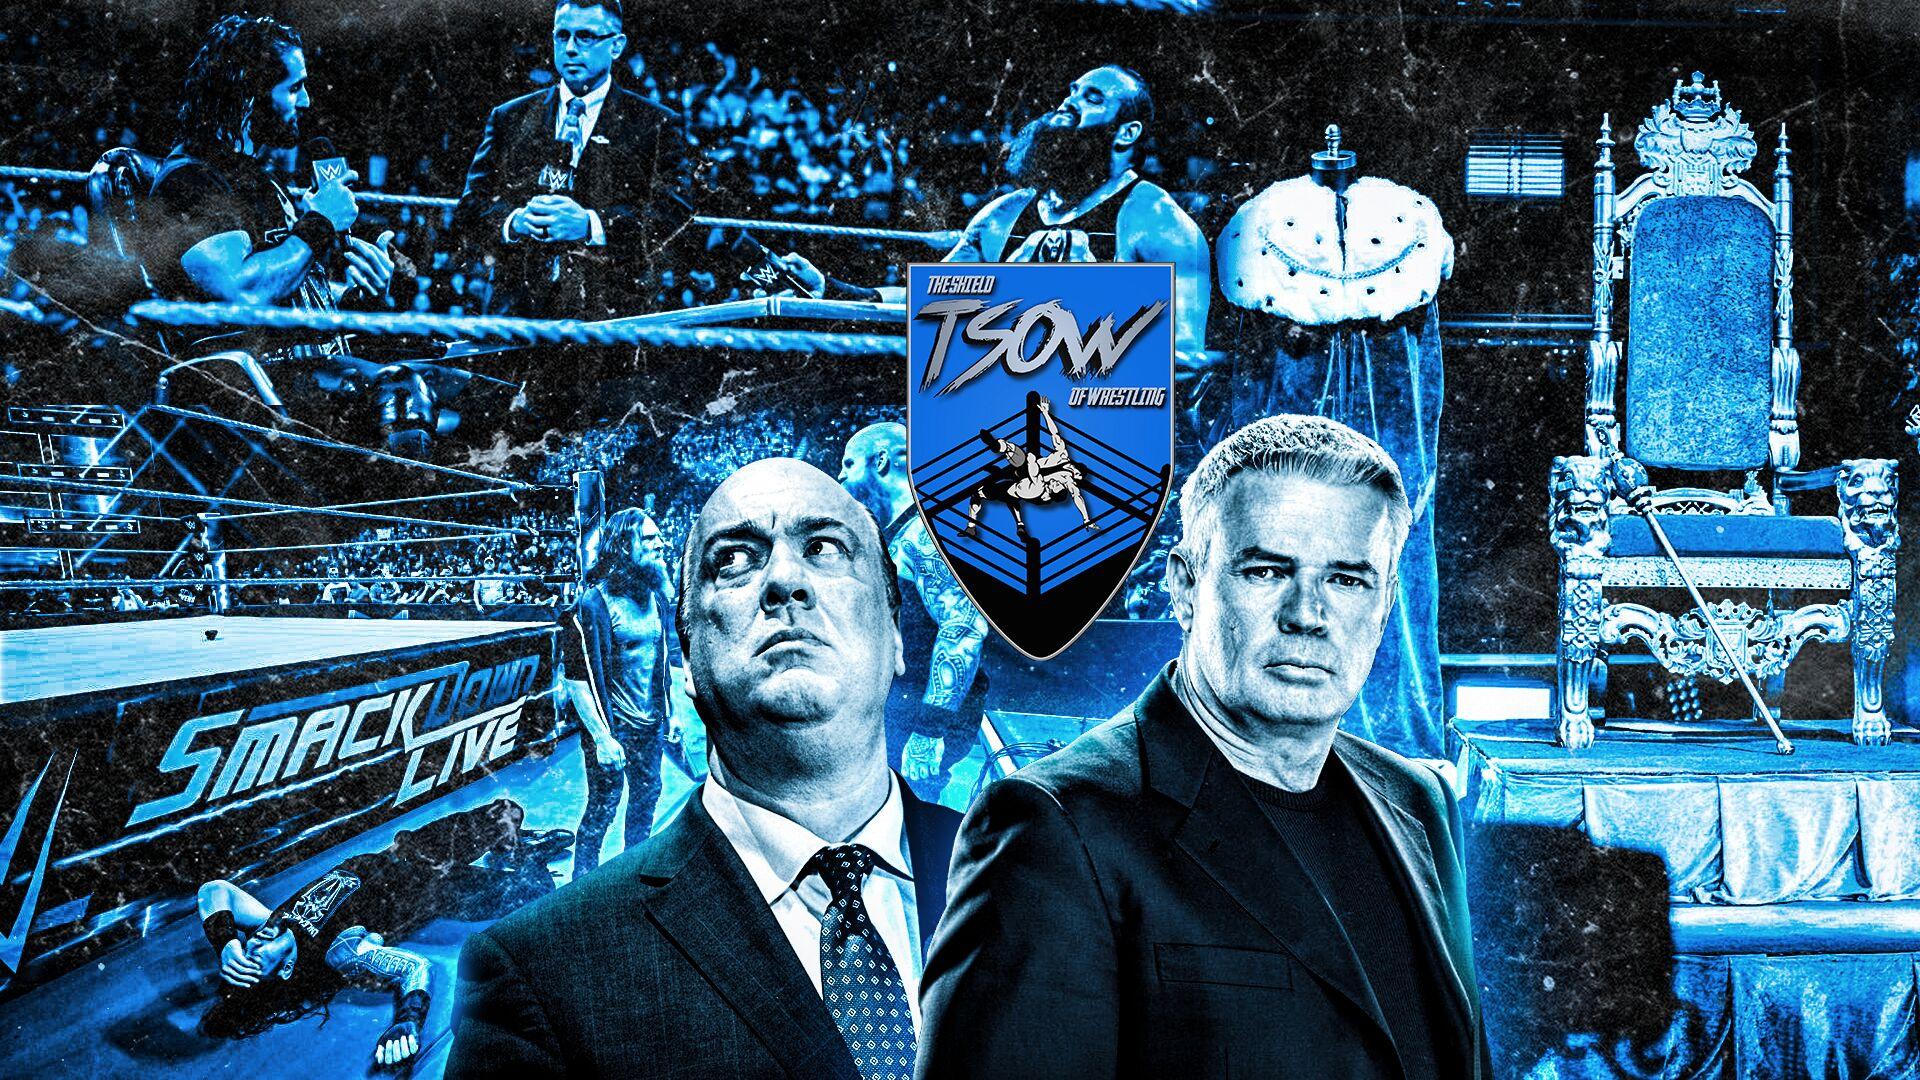 Raw & SmackDown - Paul Heyman & Eric Bischoff